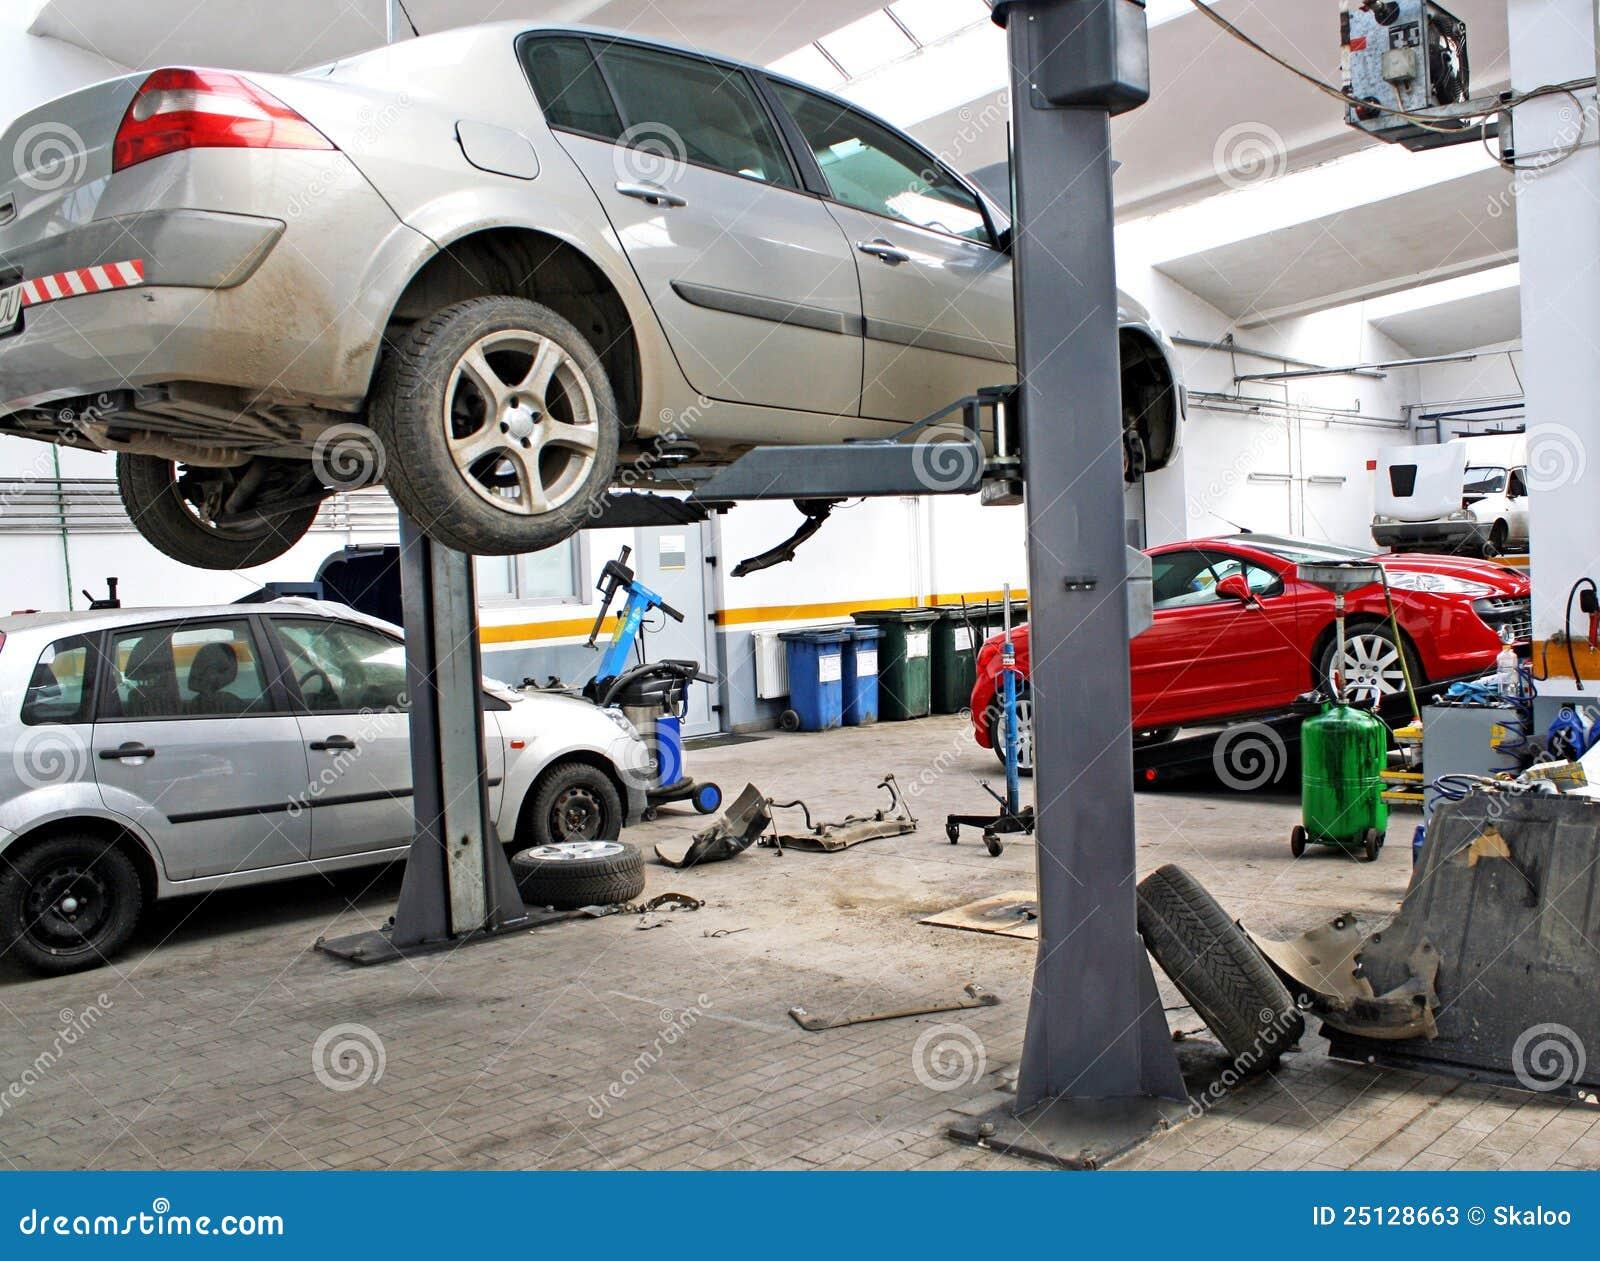 Garage automobile de service photos stock image 25128663 for Gestion garage automobile